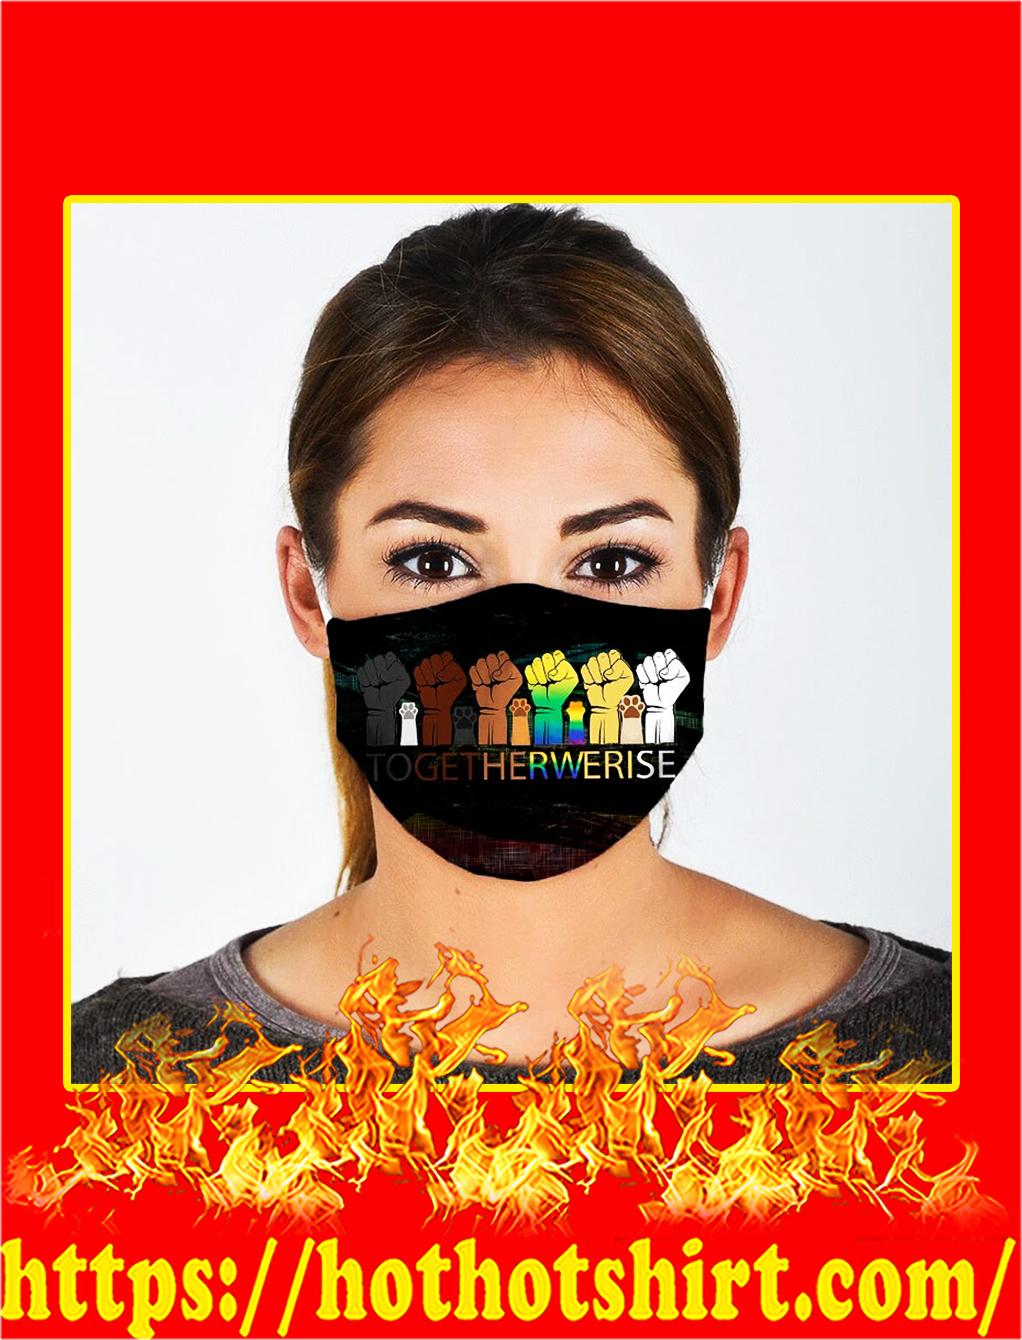 LGBT pride hand togetherwerise face mask- pic 1